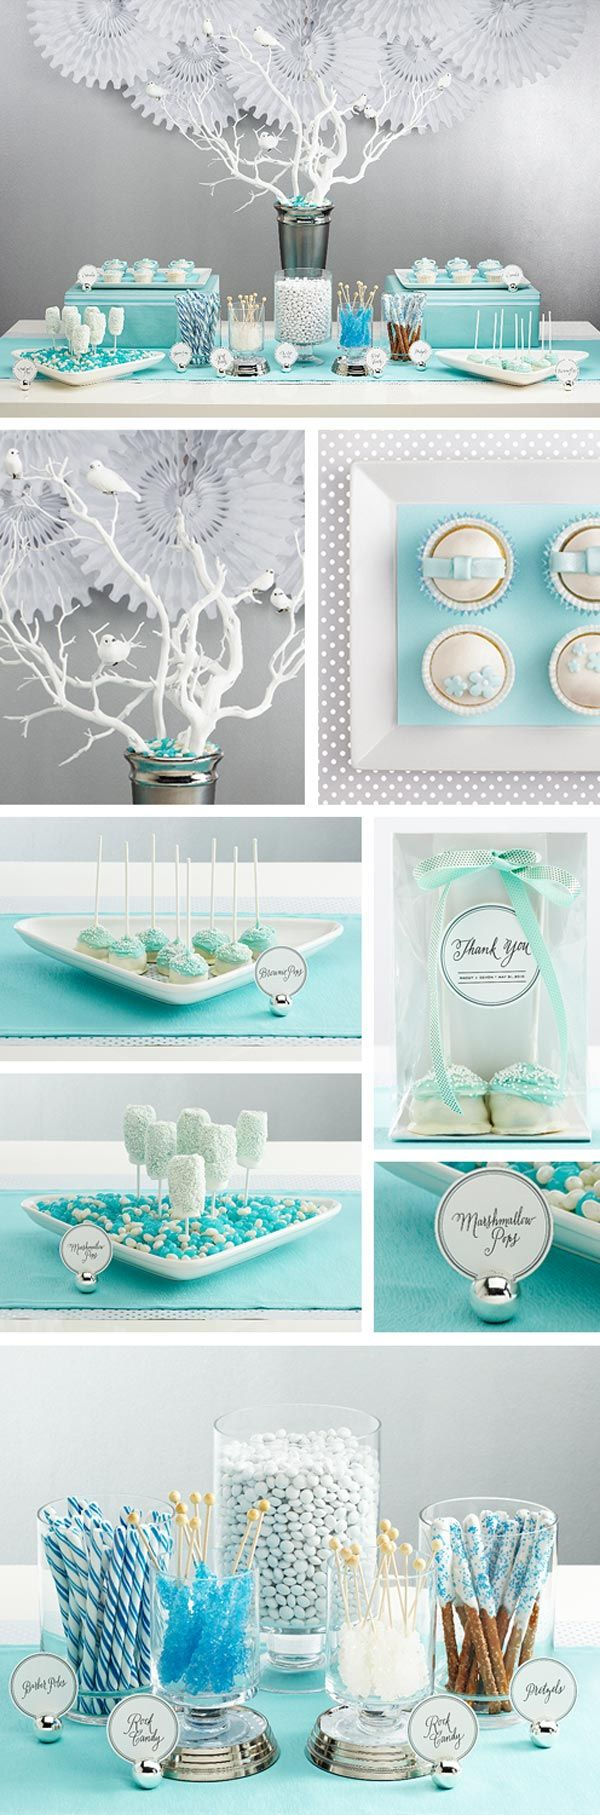 Tiffany Blue Dessert Table